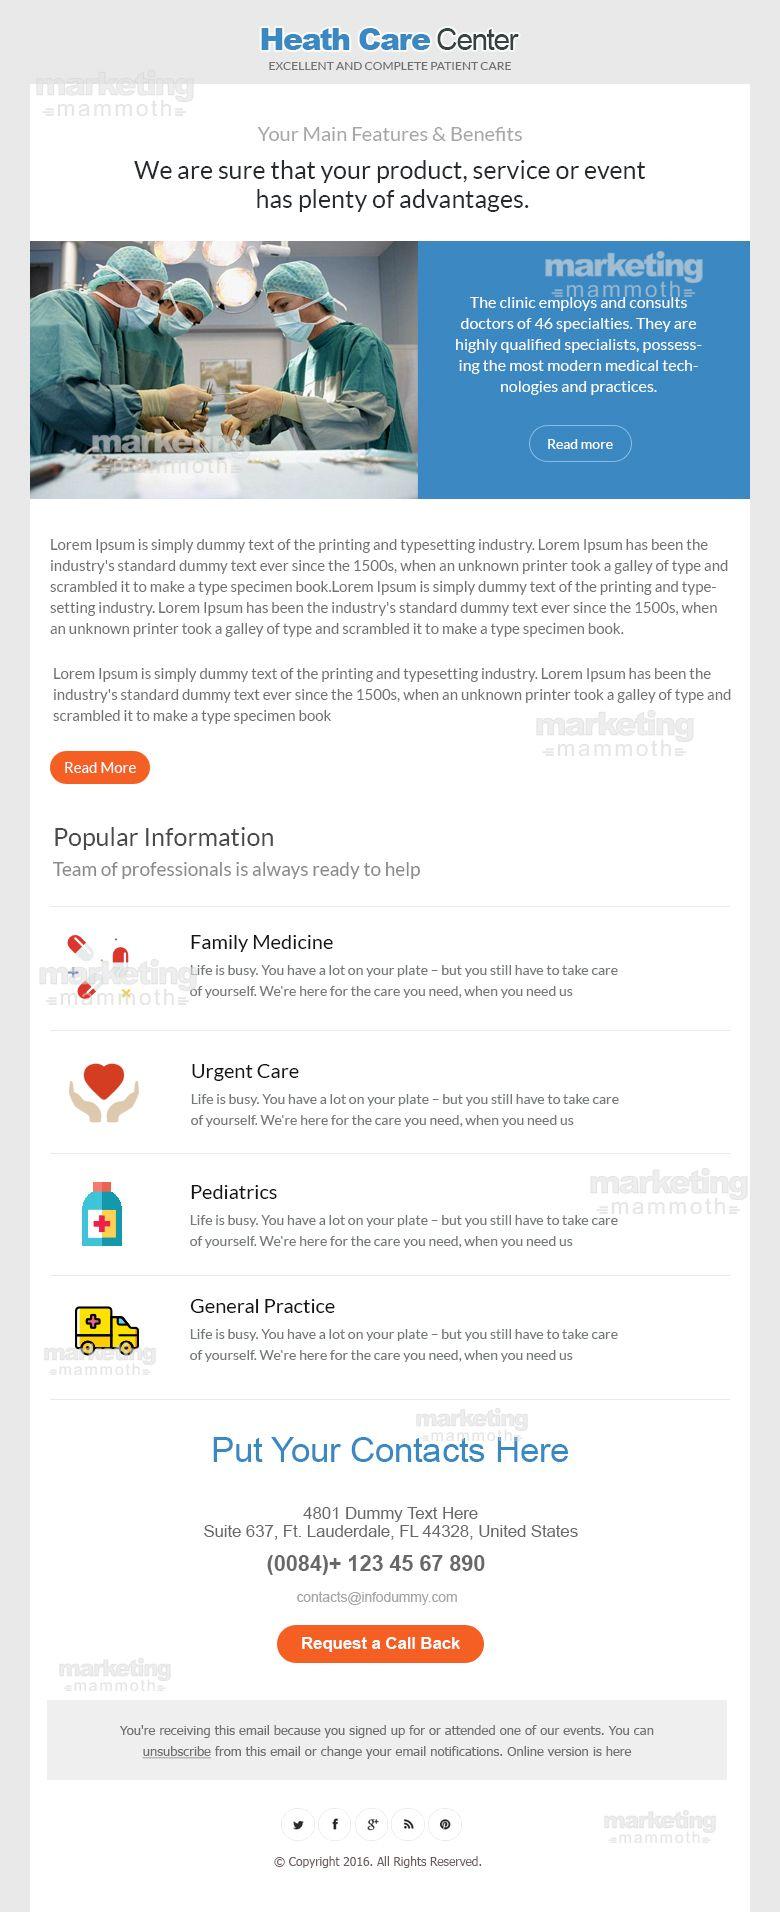 Pin by Marketing Mammoth on Marketing Mammoth Heath care